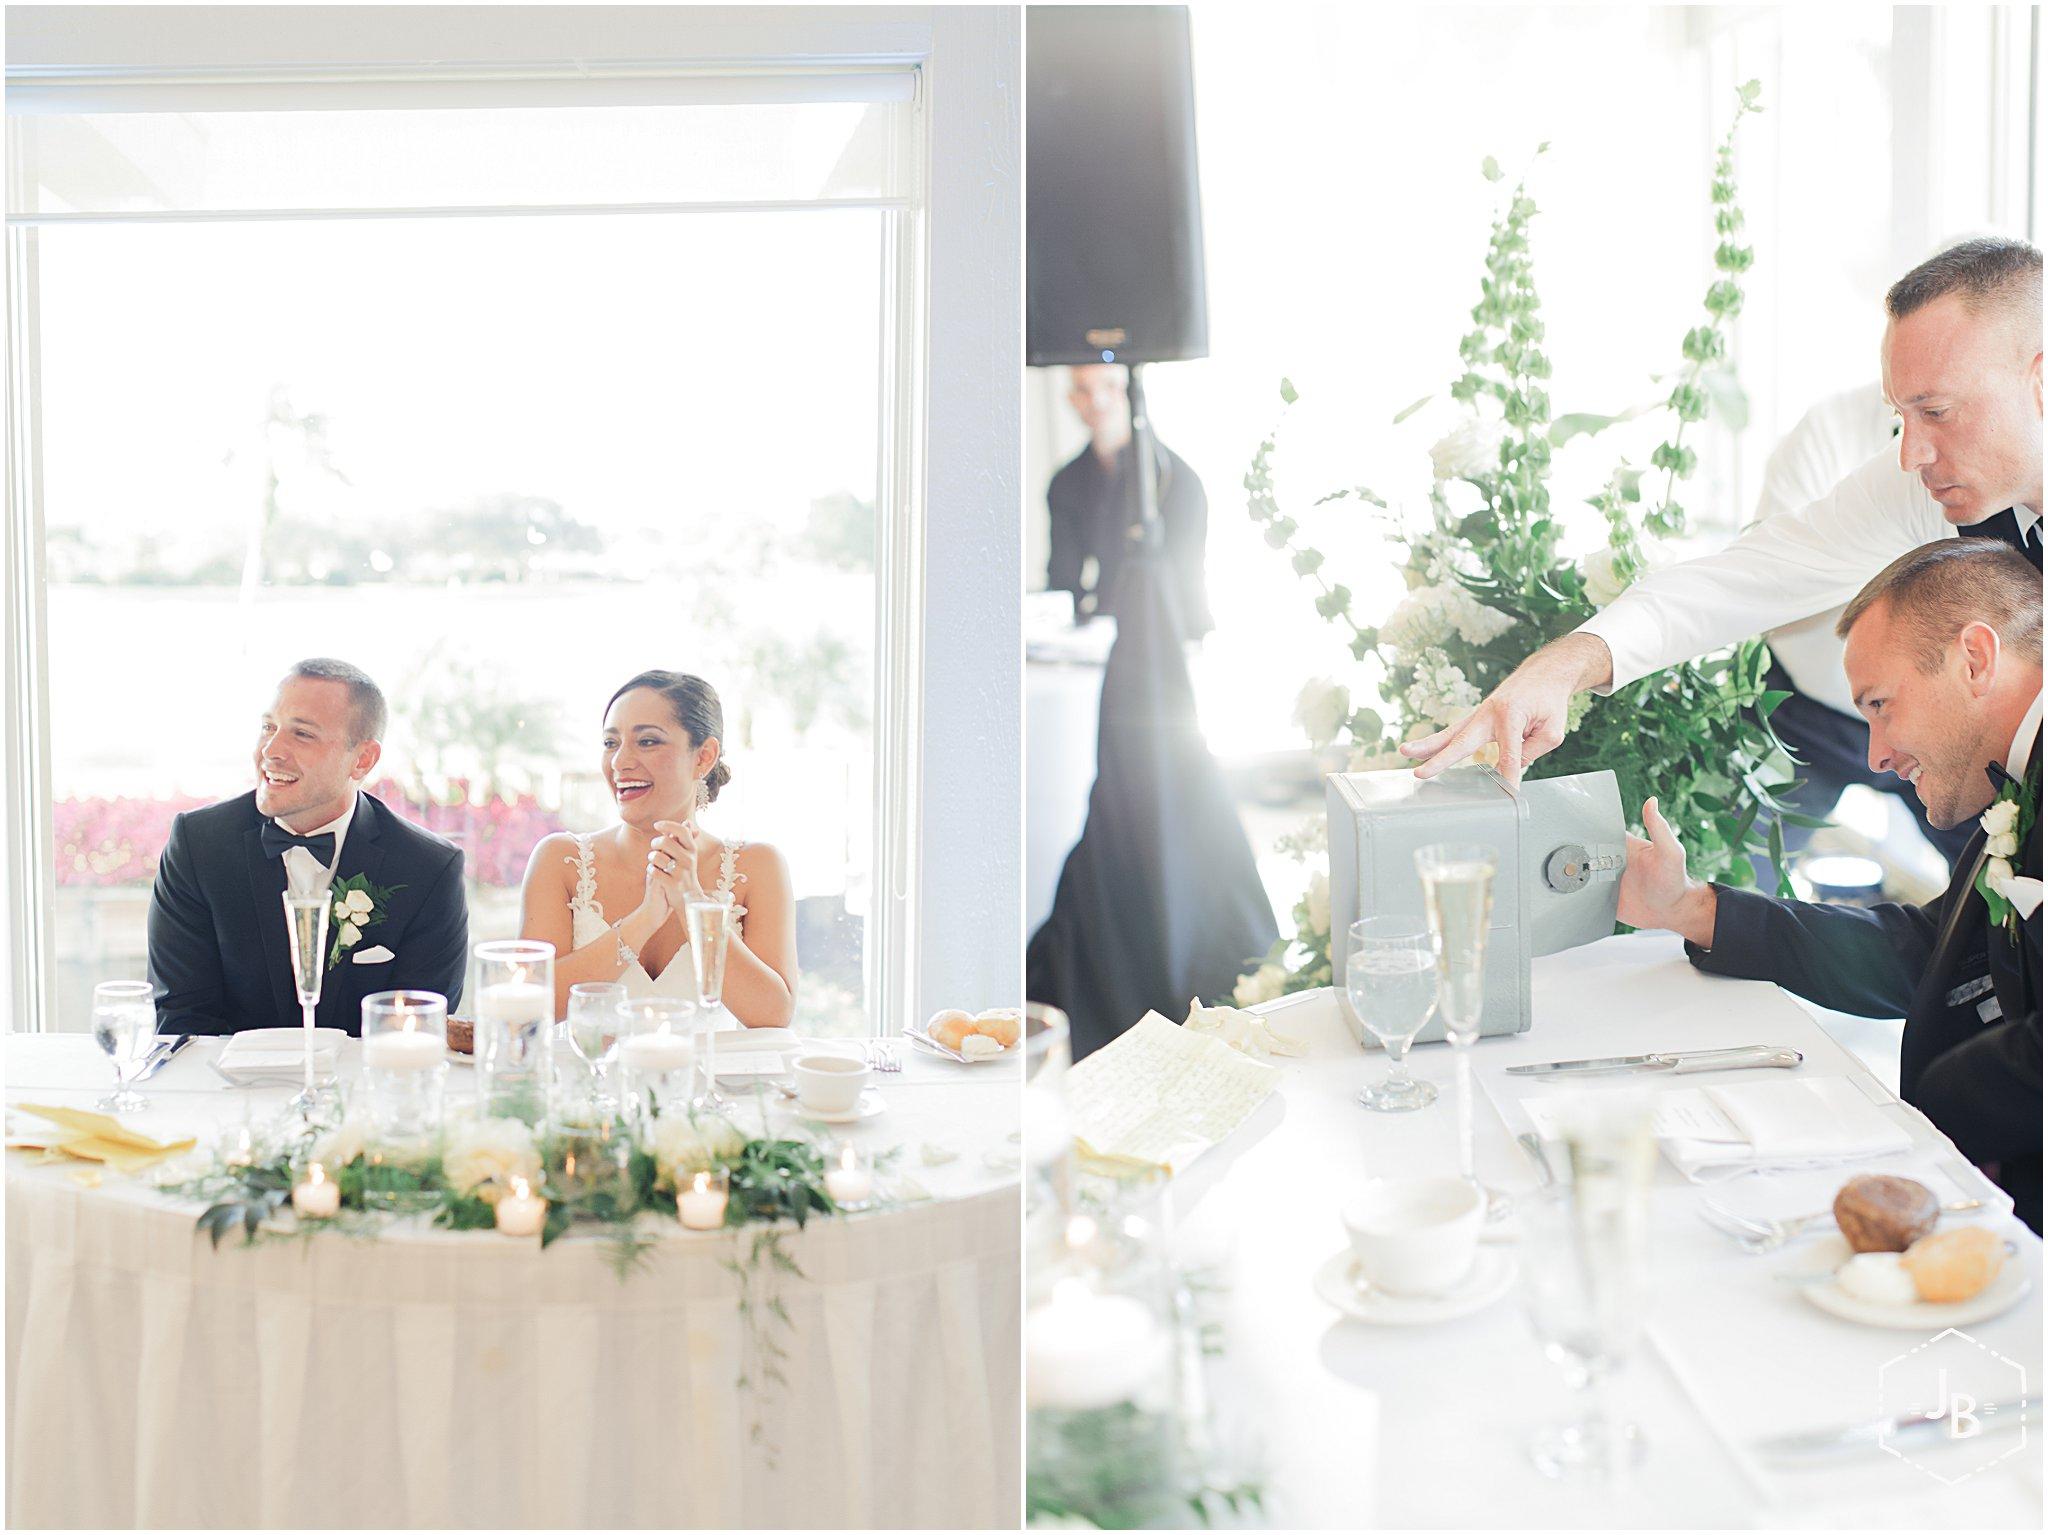 WeddingandEngagementFloridaPhotographer_0298.jpg